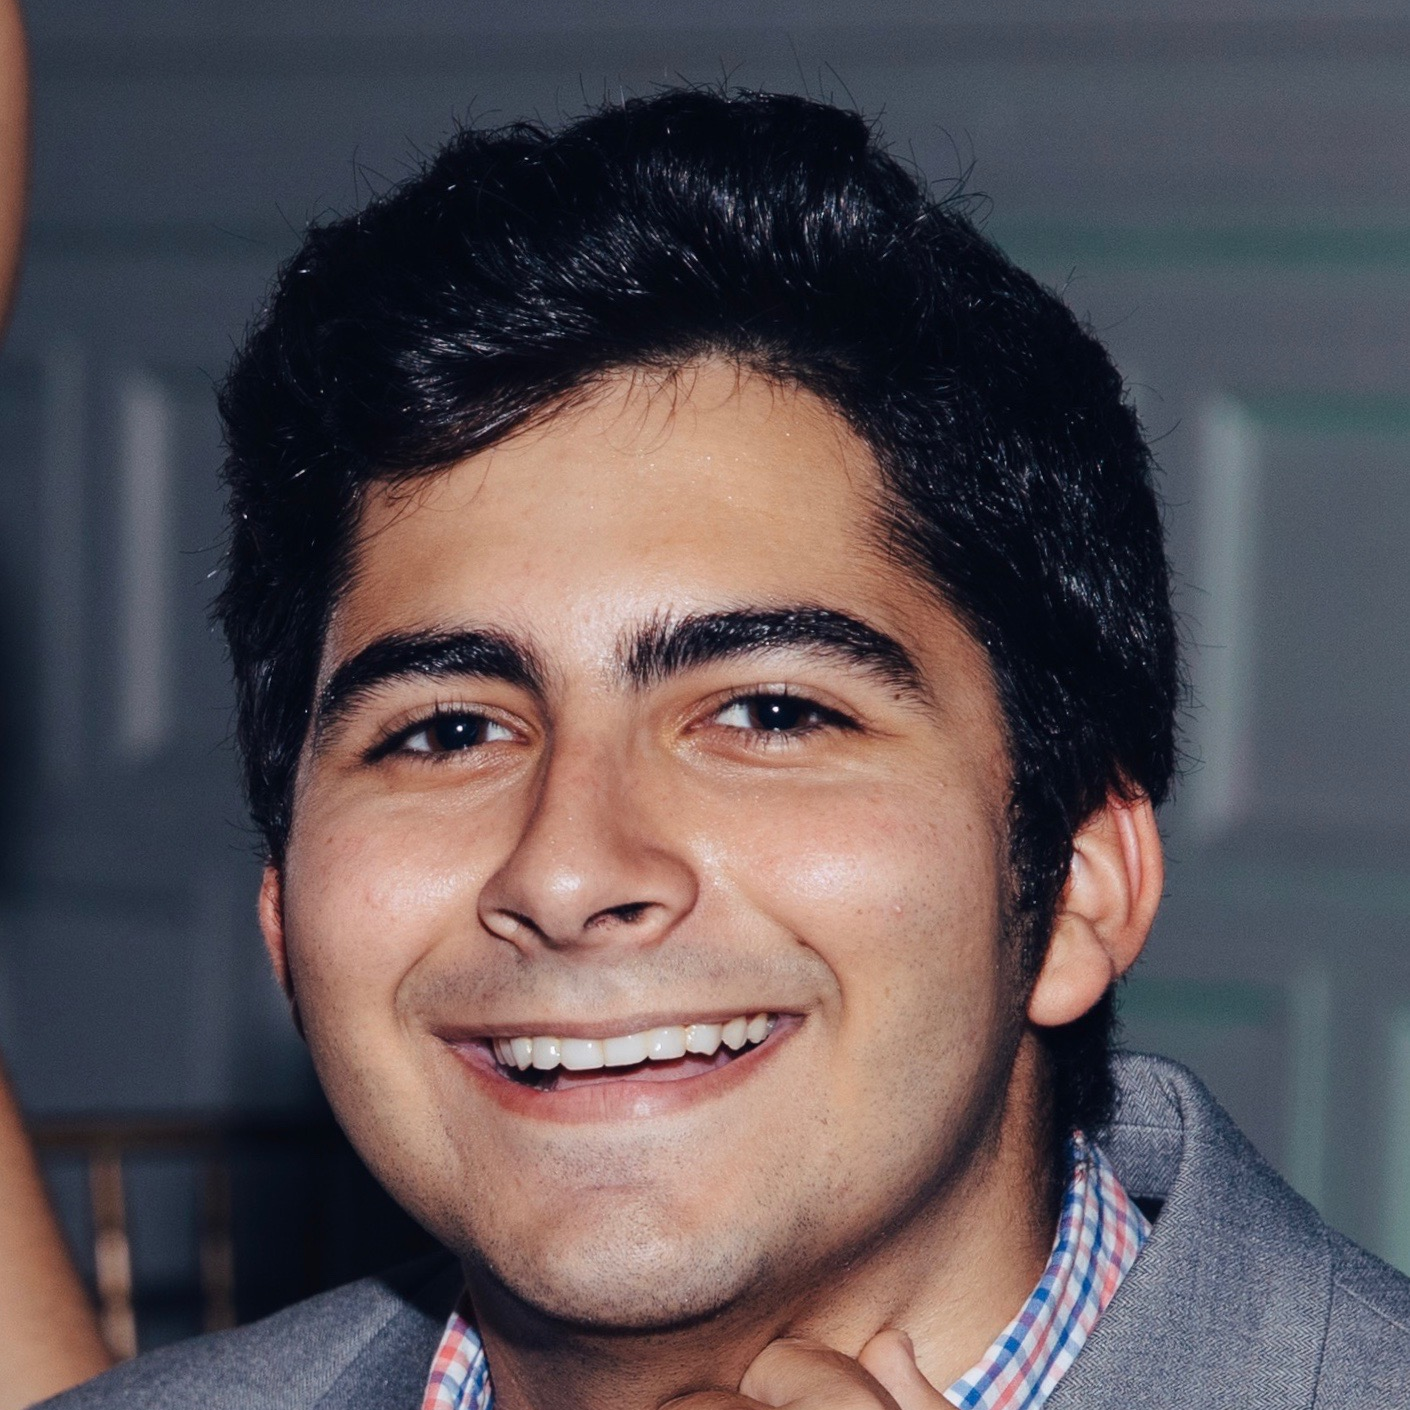 Jackson Parli from University of Pennsylvania